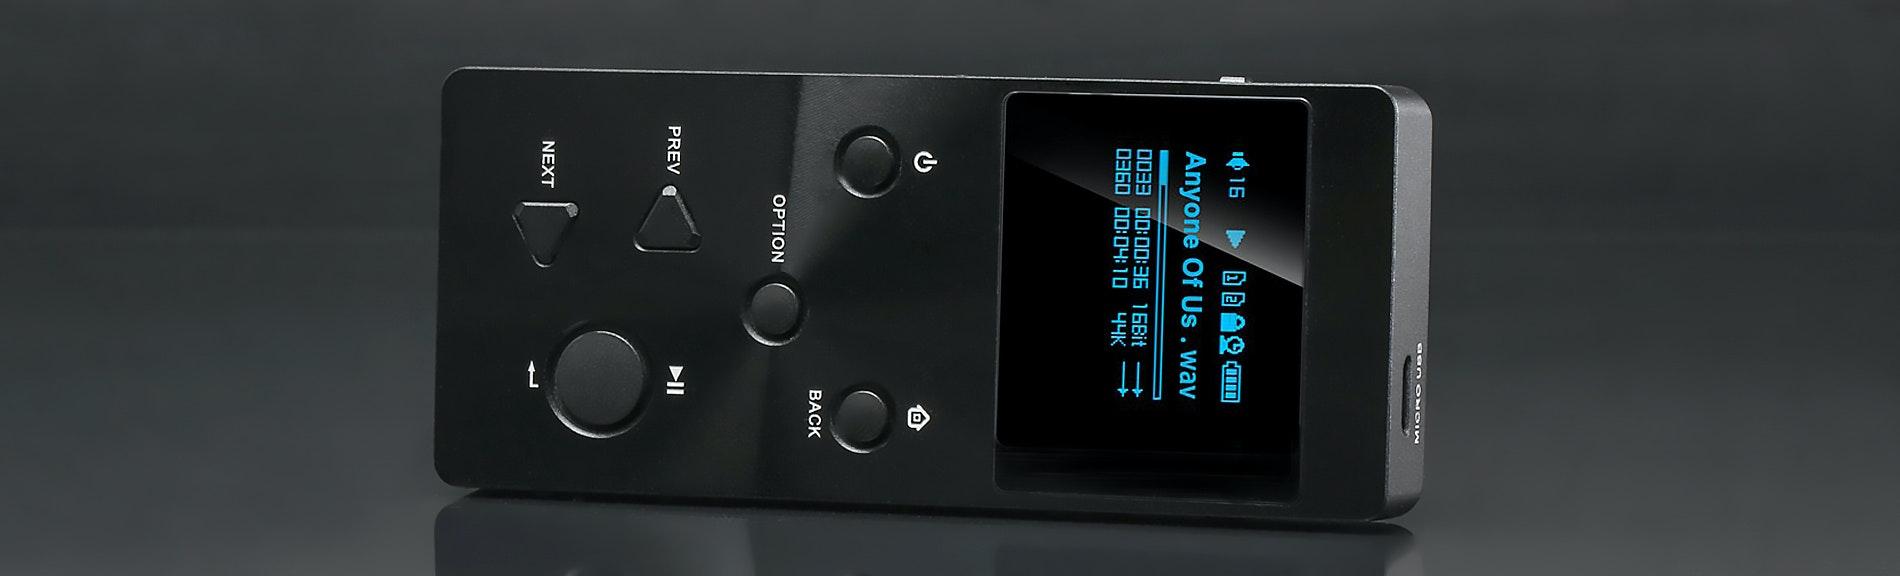 XDuoo X3 Digital Audio Player